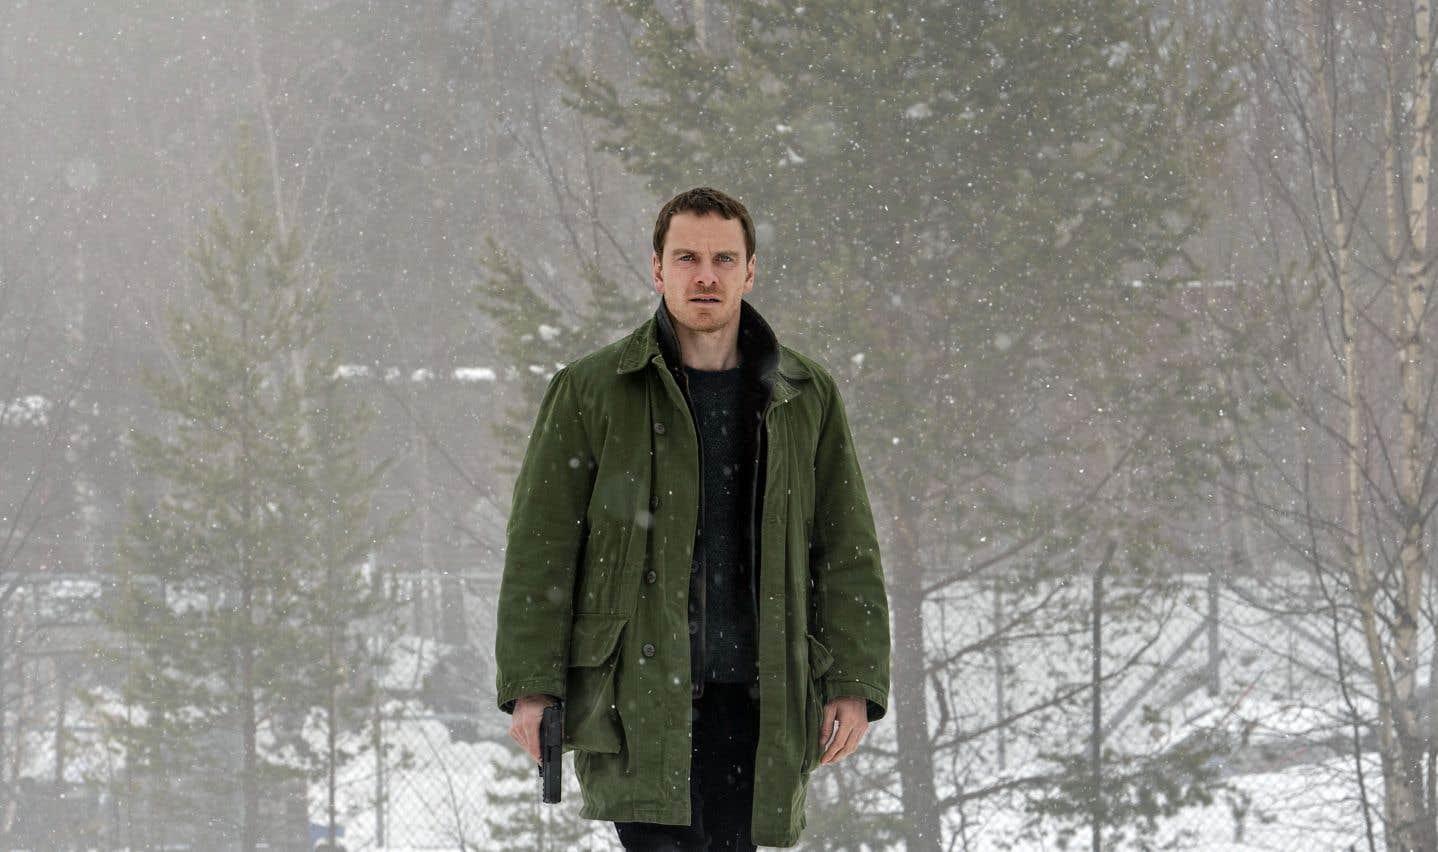 «Le bonhomme de neige» – Neige noire